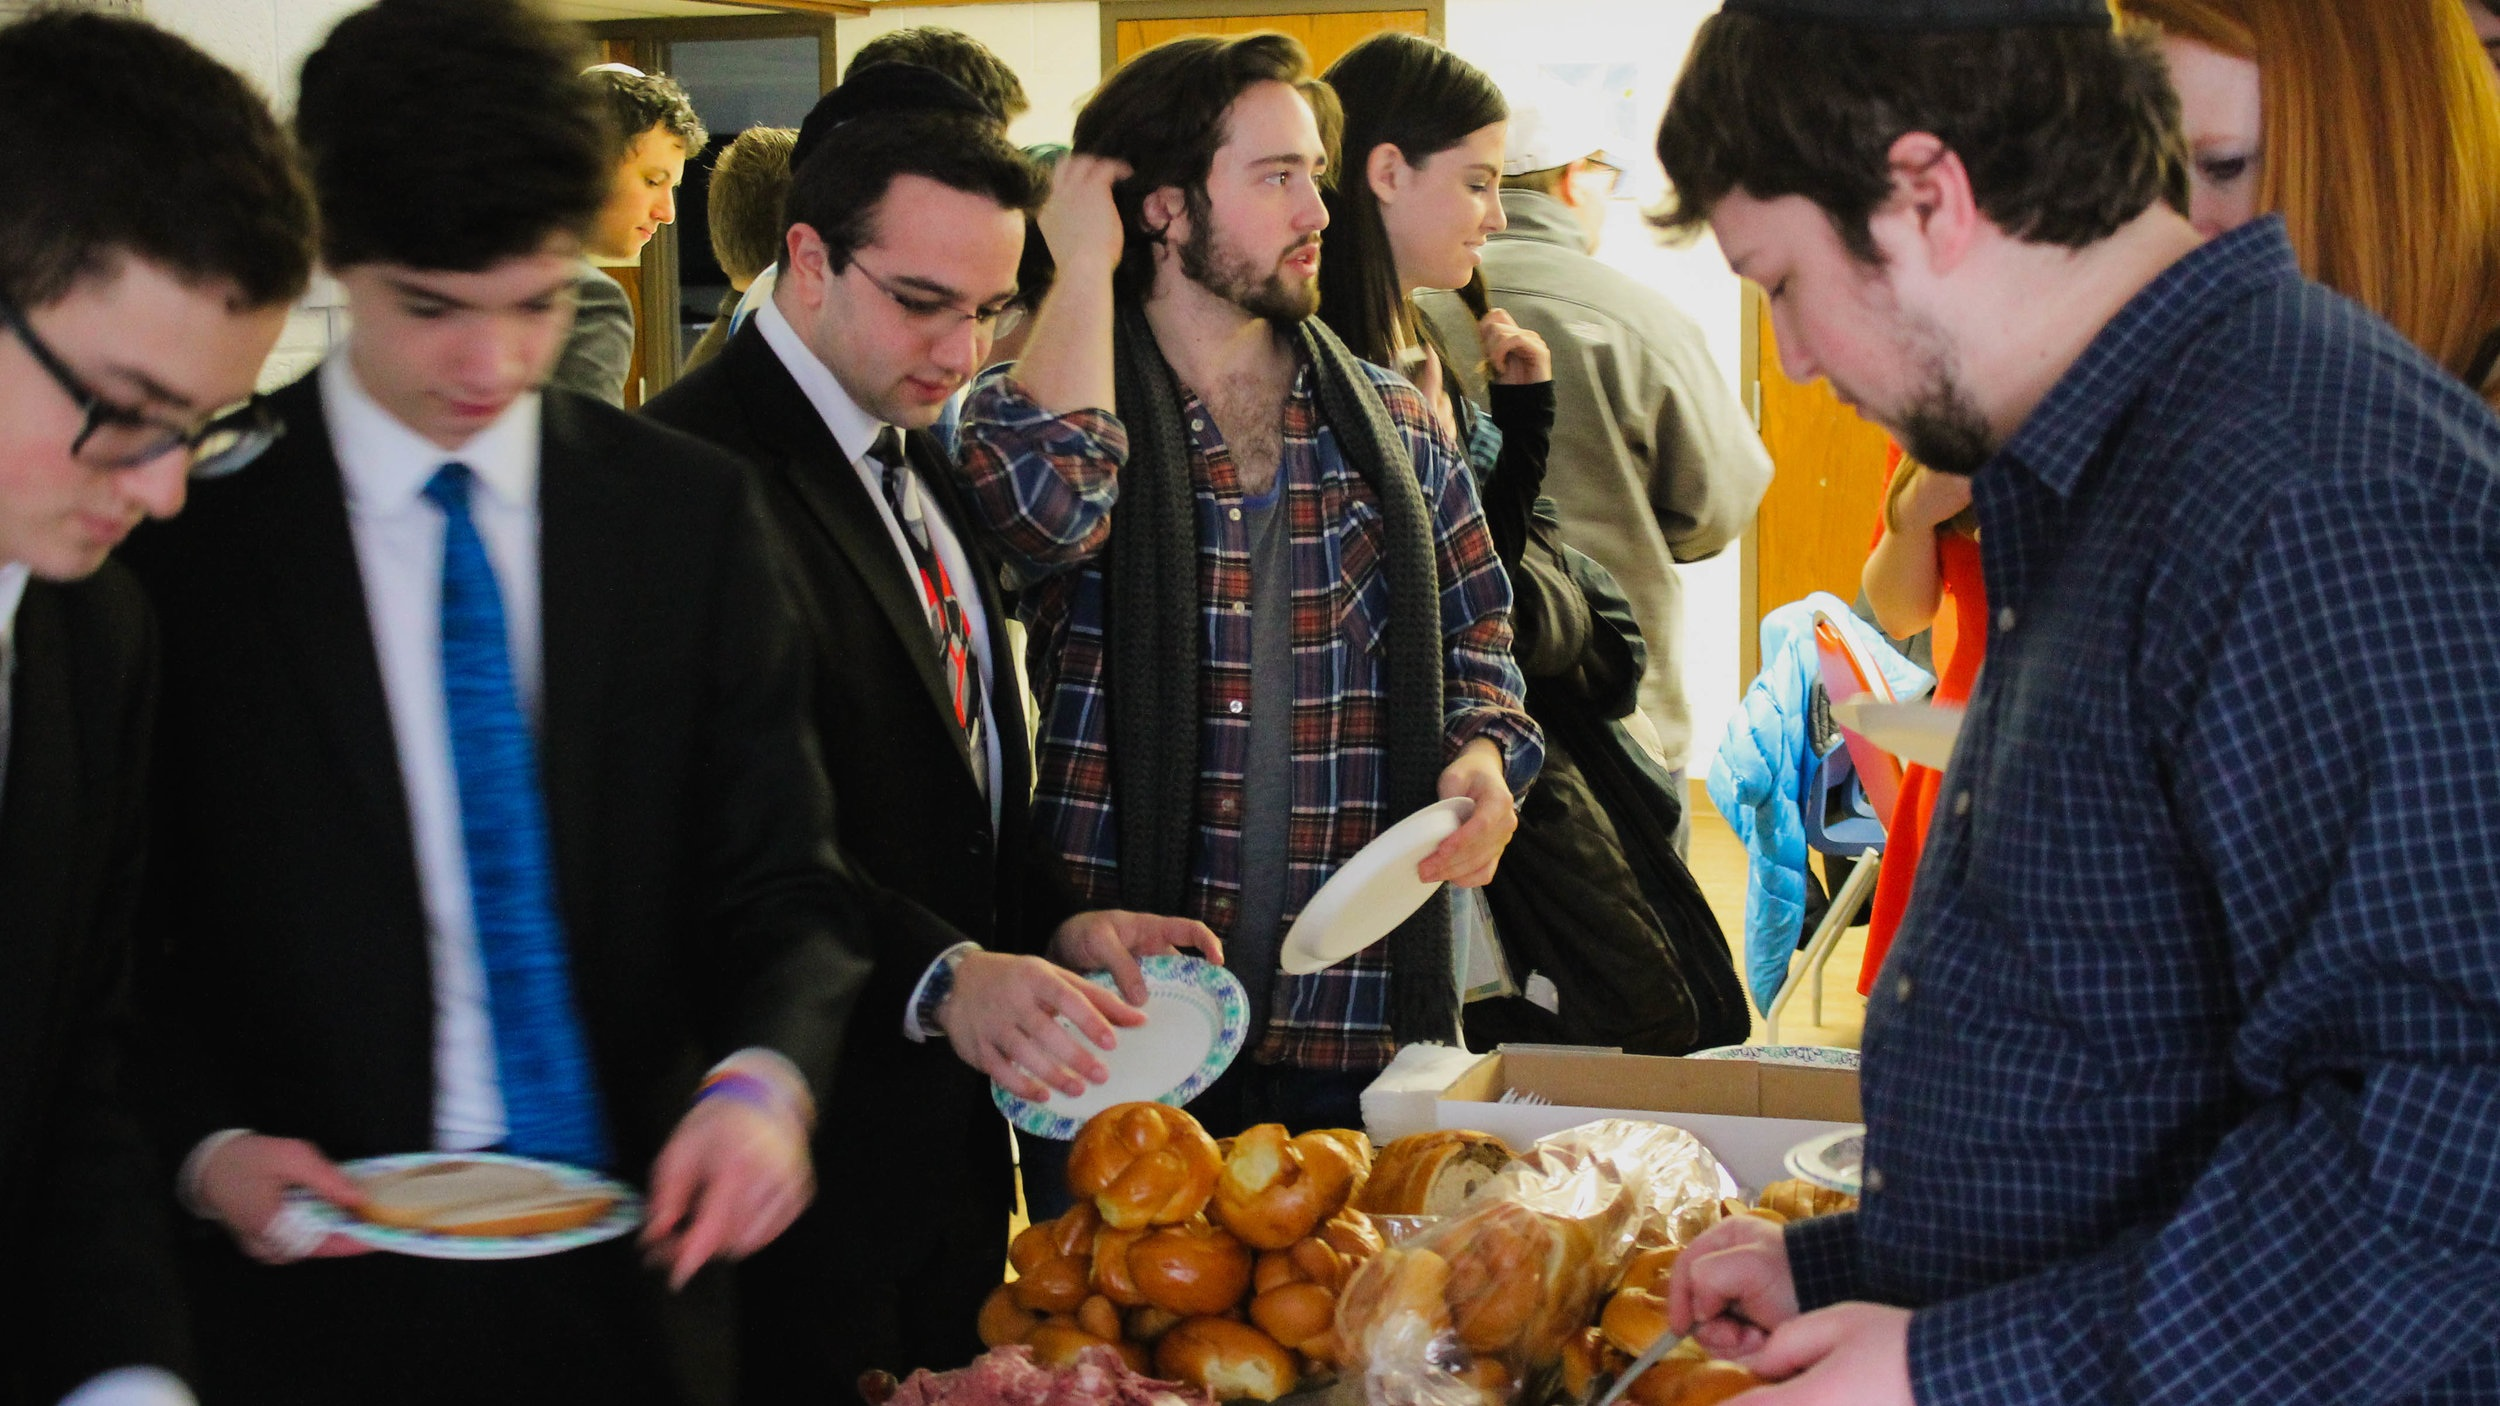 Sponsor a Bagel Brunch - Brighten up students' weeks by providing a Wednesday bagel brunch!